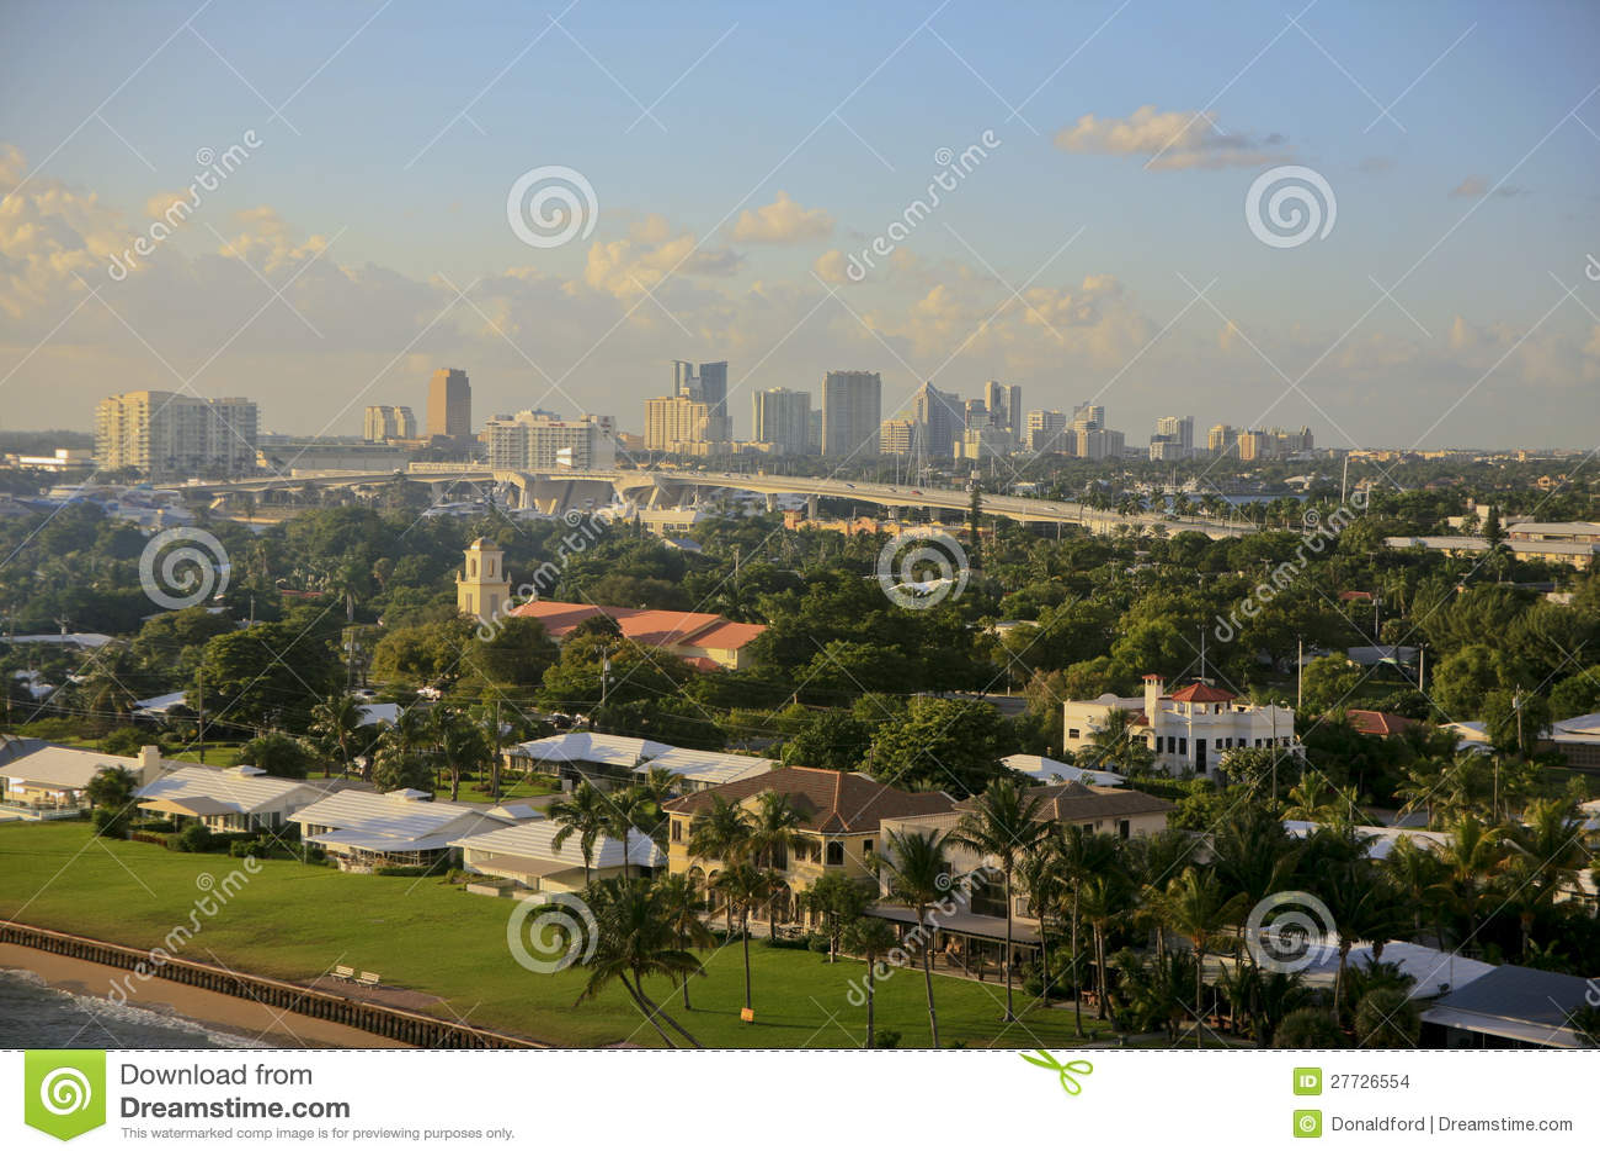 Skyline, Fort Lauderdale, Florida, USA.